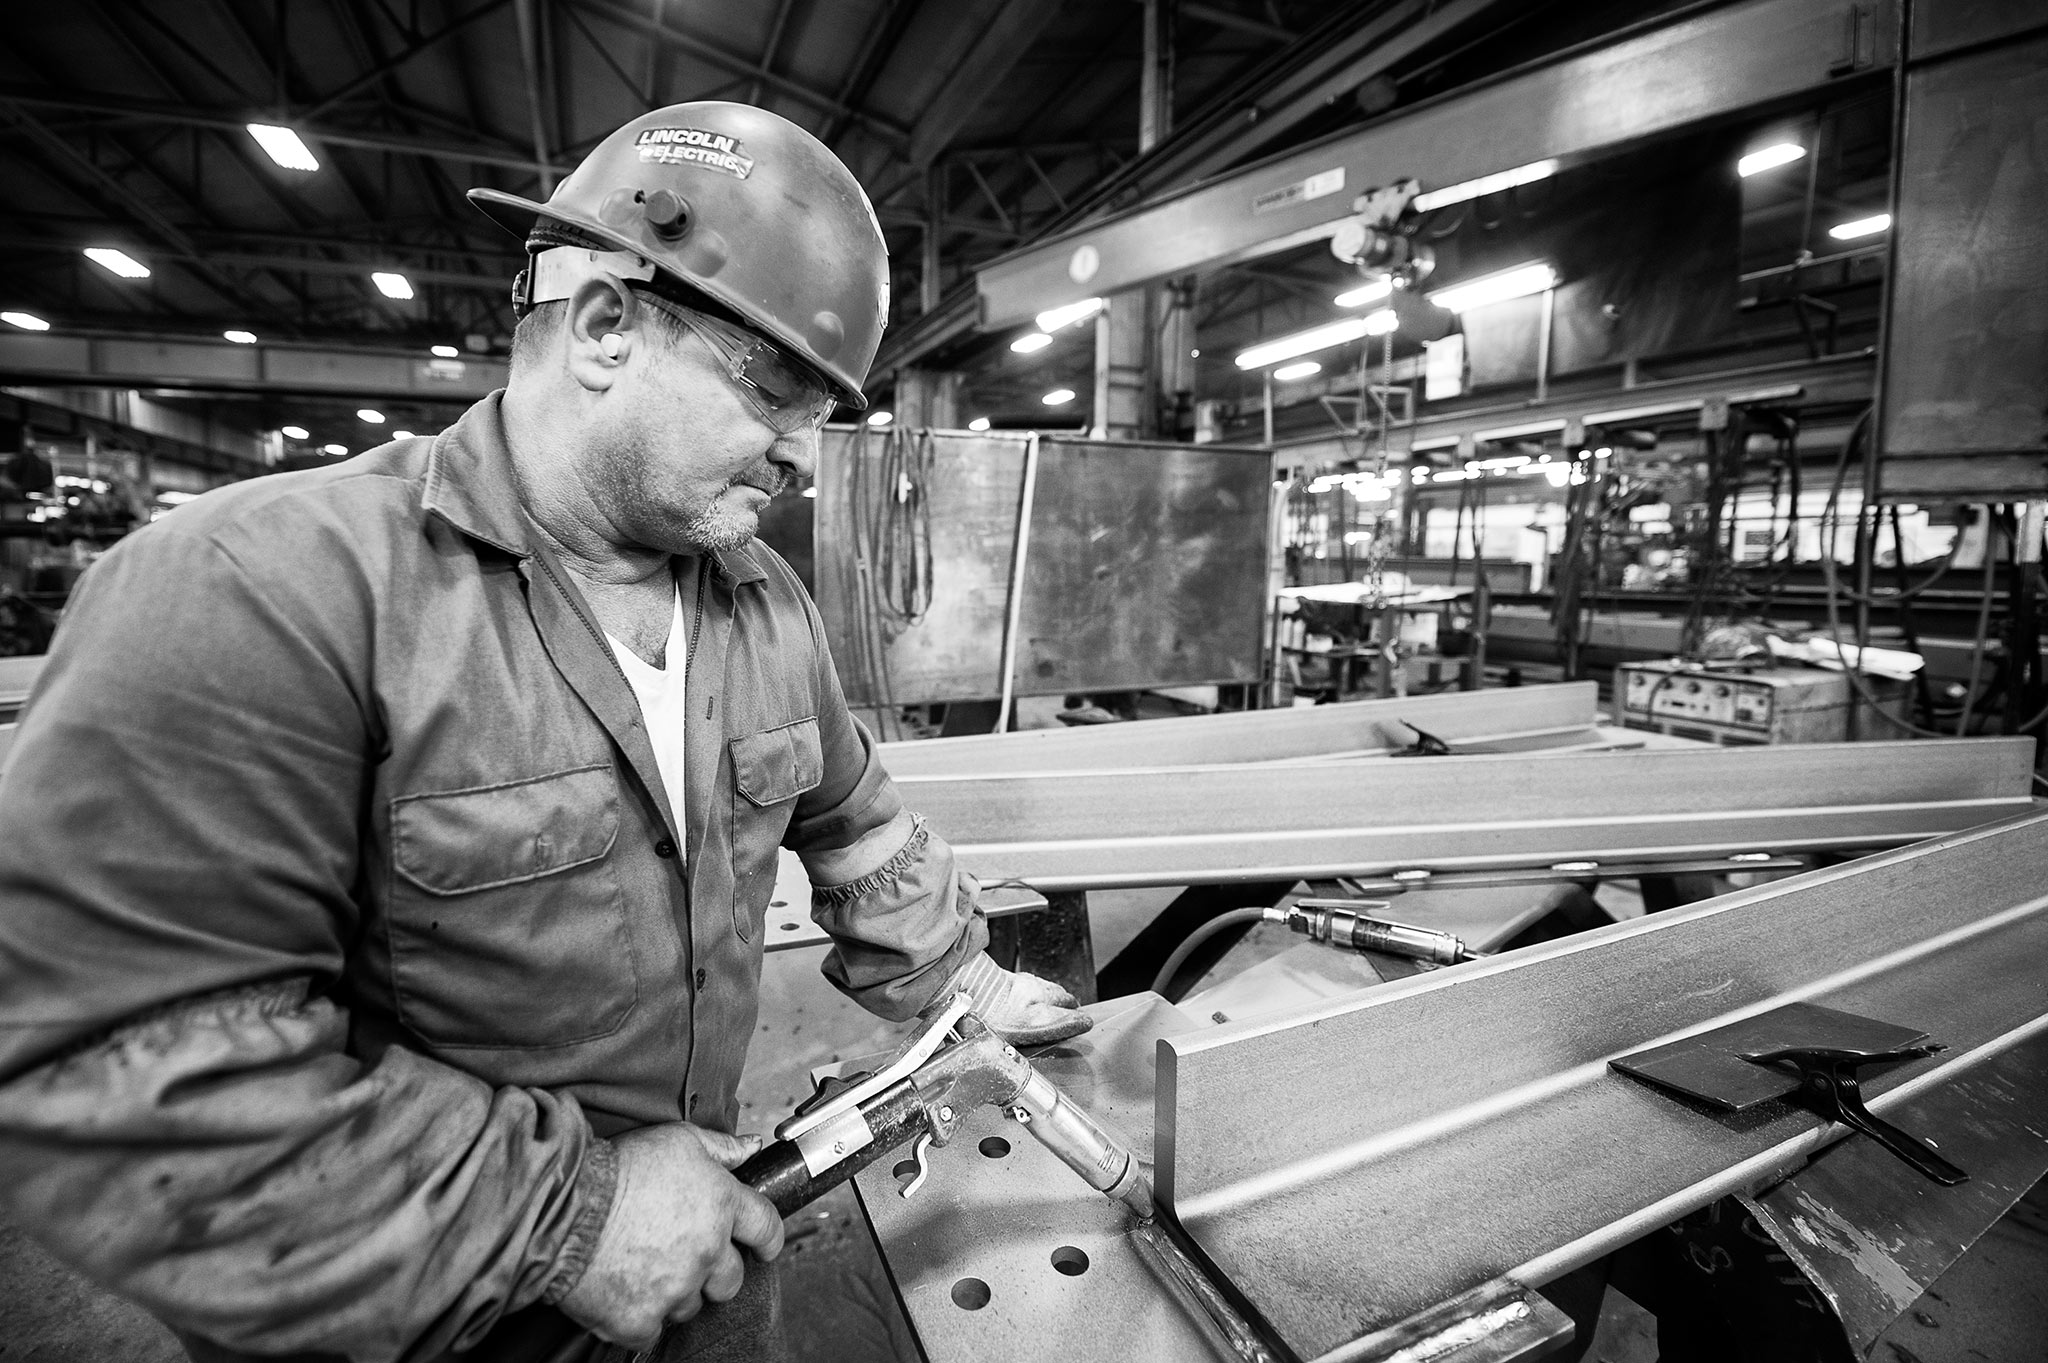 Steel worker in Lancaster, Pennsylvania. List of clients